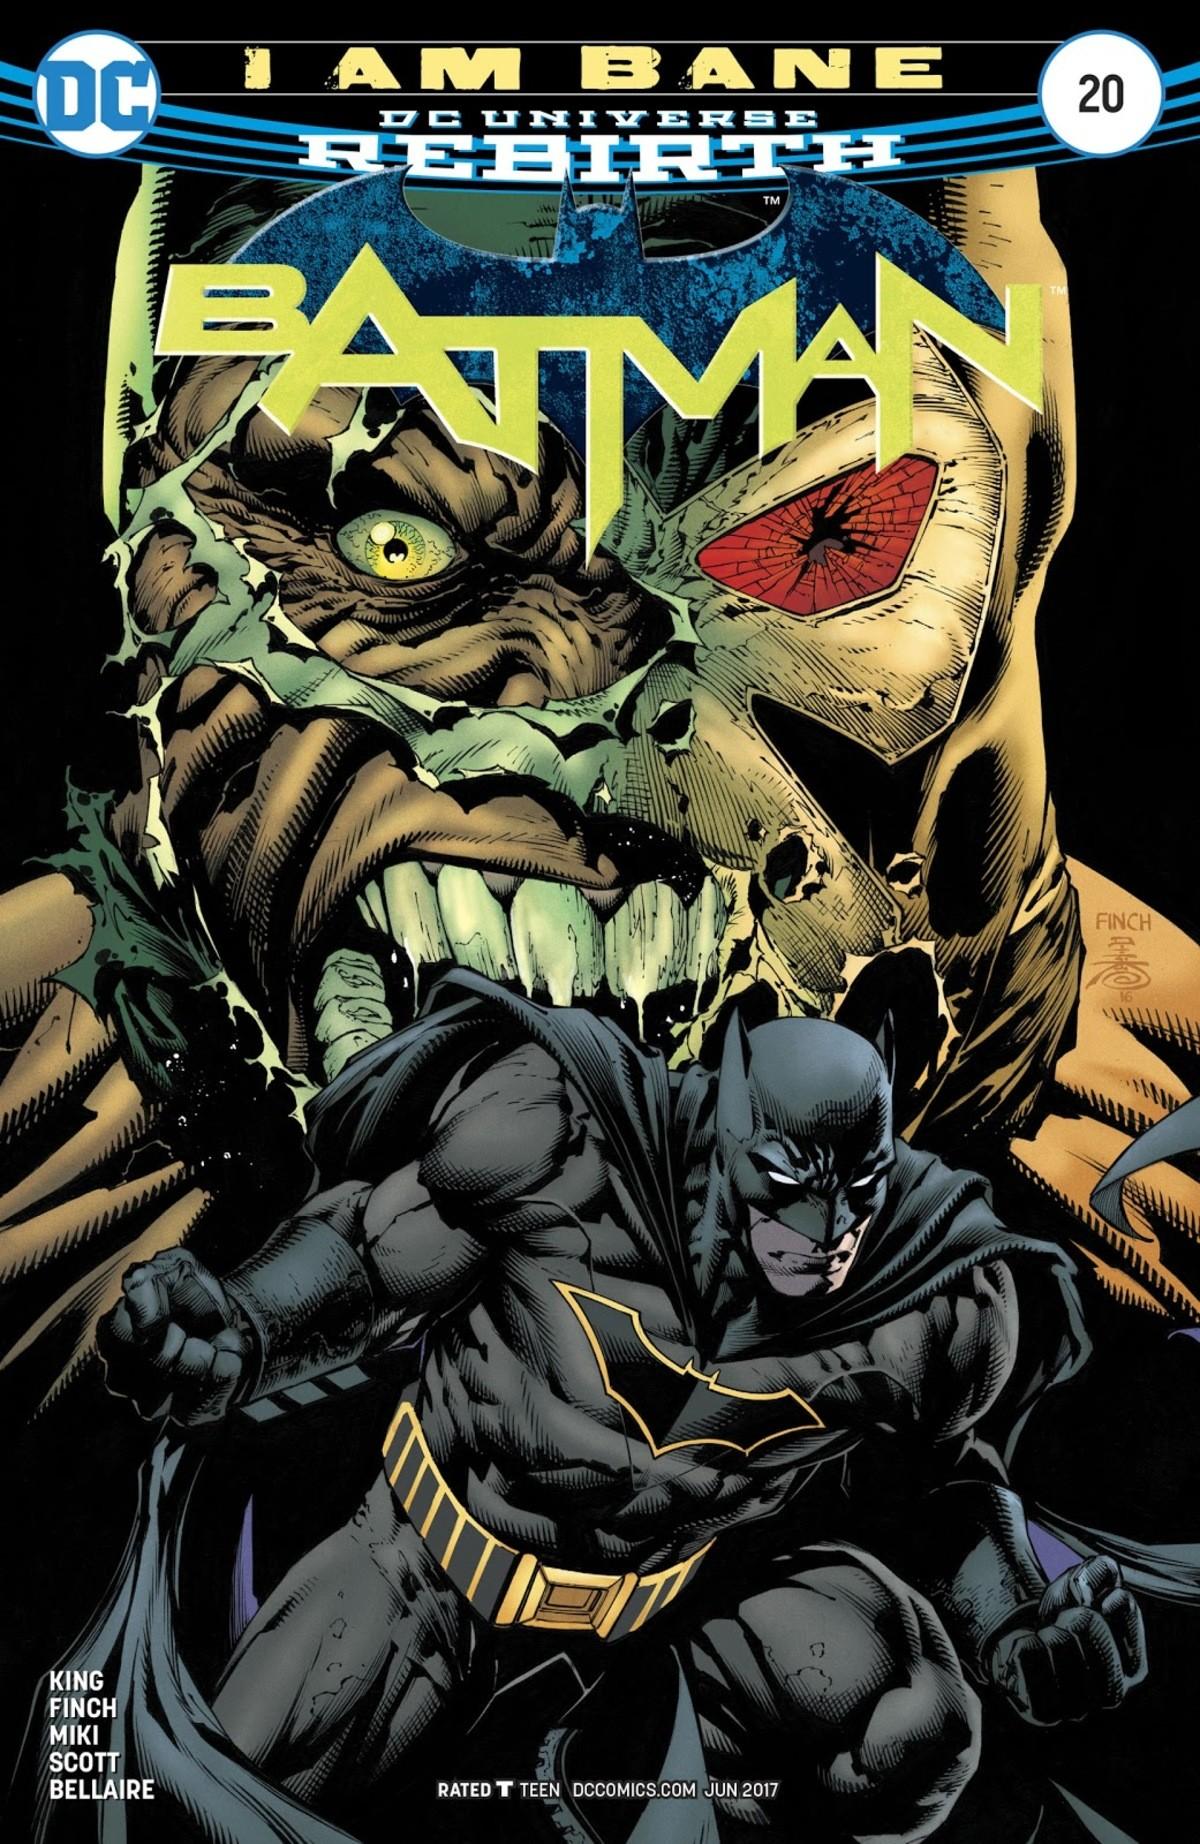 Batman #20. . KING FINCH MIN SCOTT BELLAIRE ' TEEN i: K)( ( yir, t) JUN 2017. all the jokes aside, That was amazing Batman #20 KING FINCH MIN SCOTT BELLAIRE ' TEEN i: K)( ( yir t) JUN 2017 all the jokes aside That was amazing